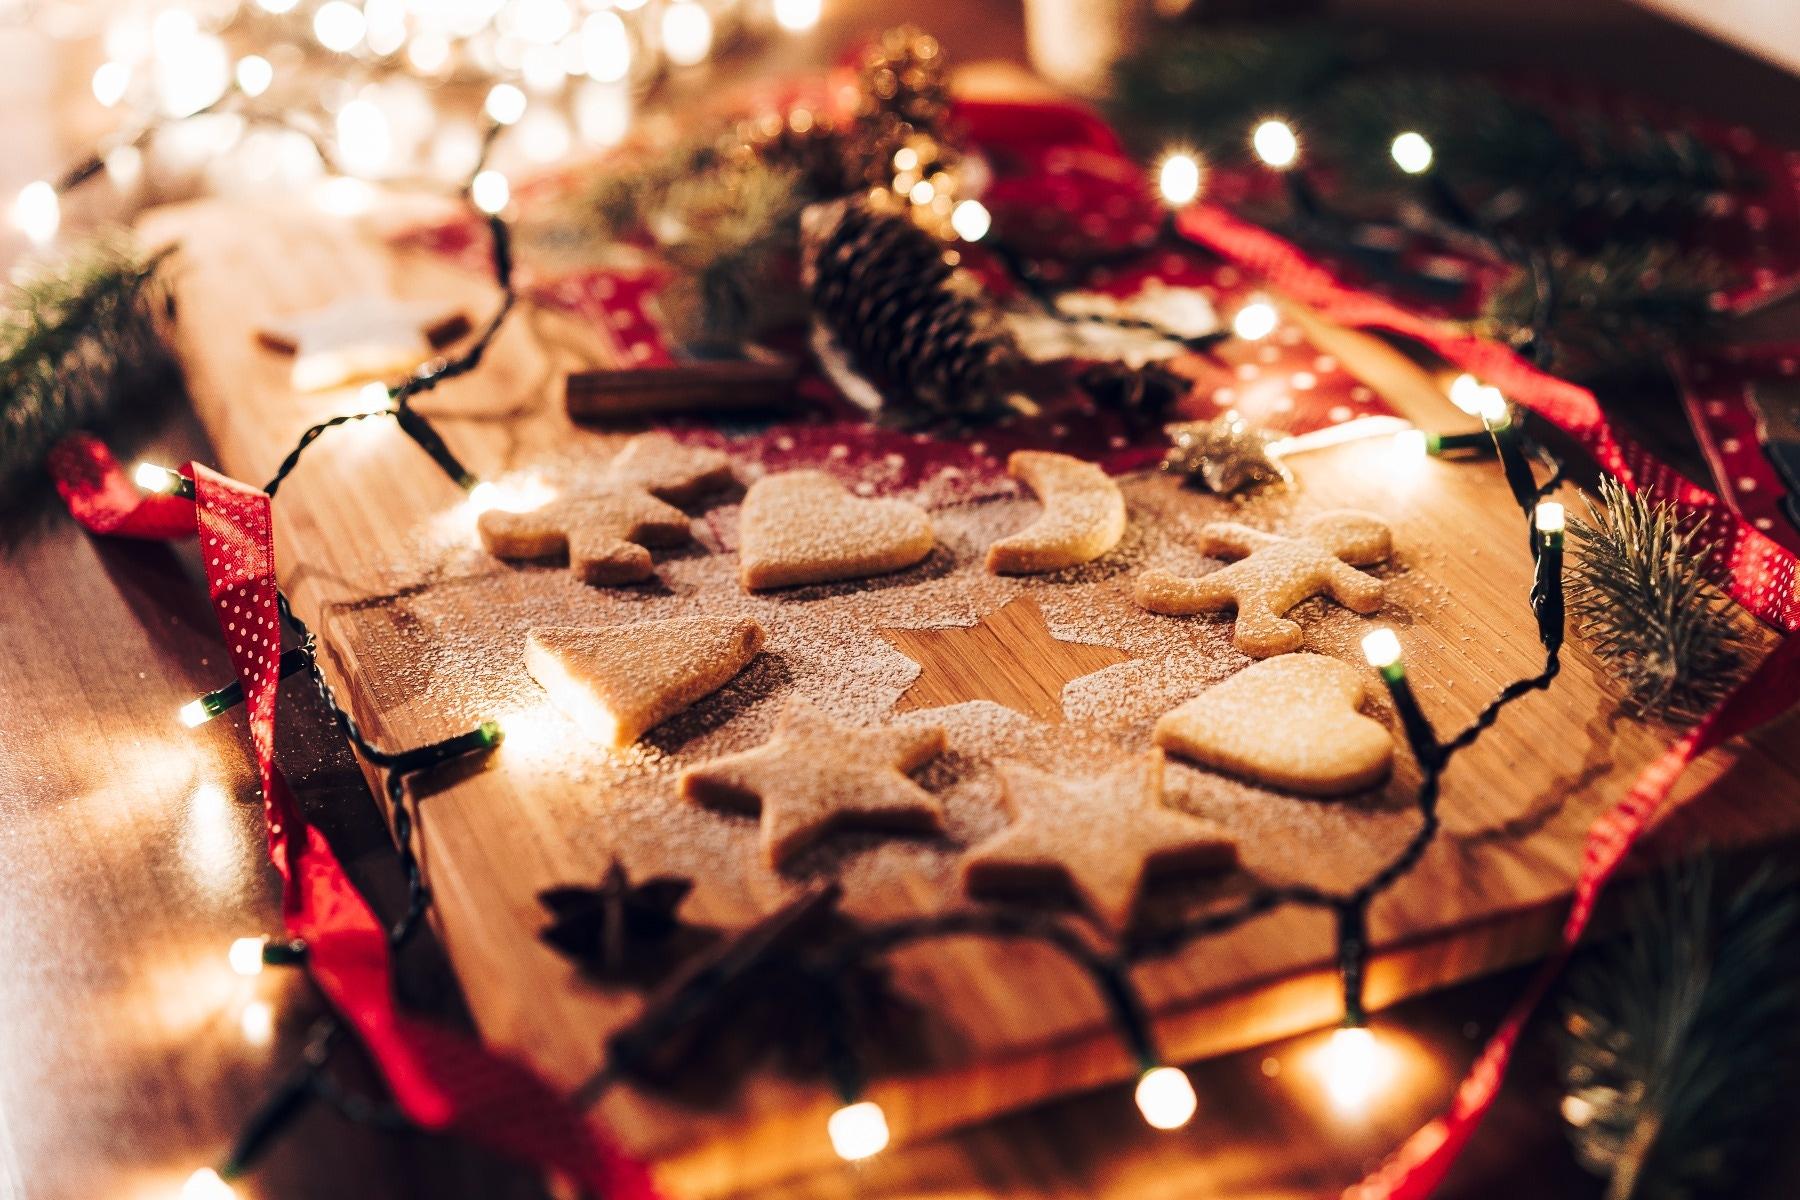 baking-christmas-cookies-dough